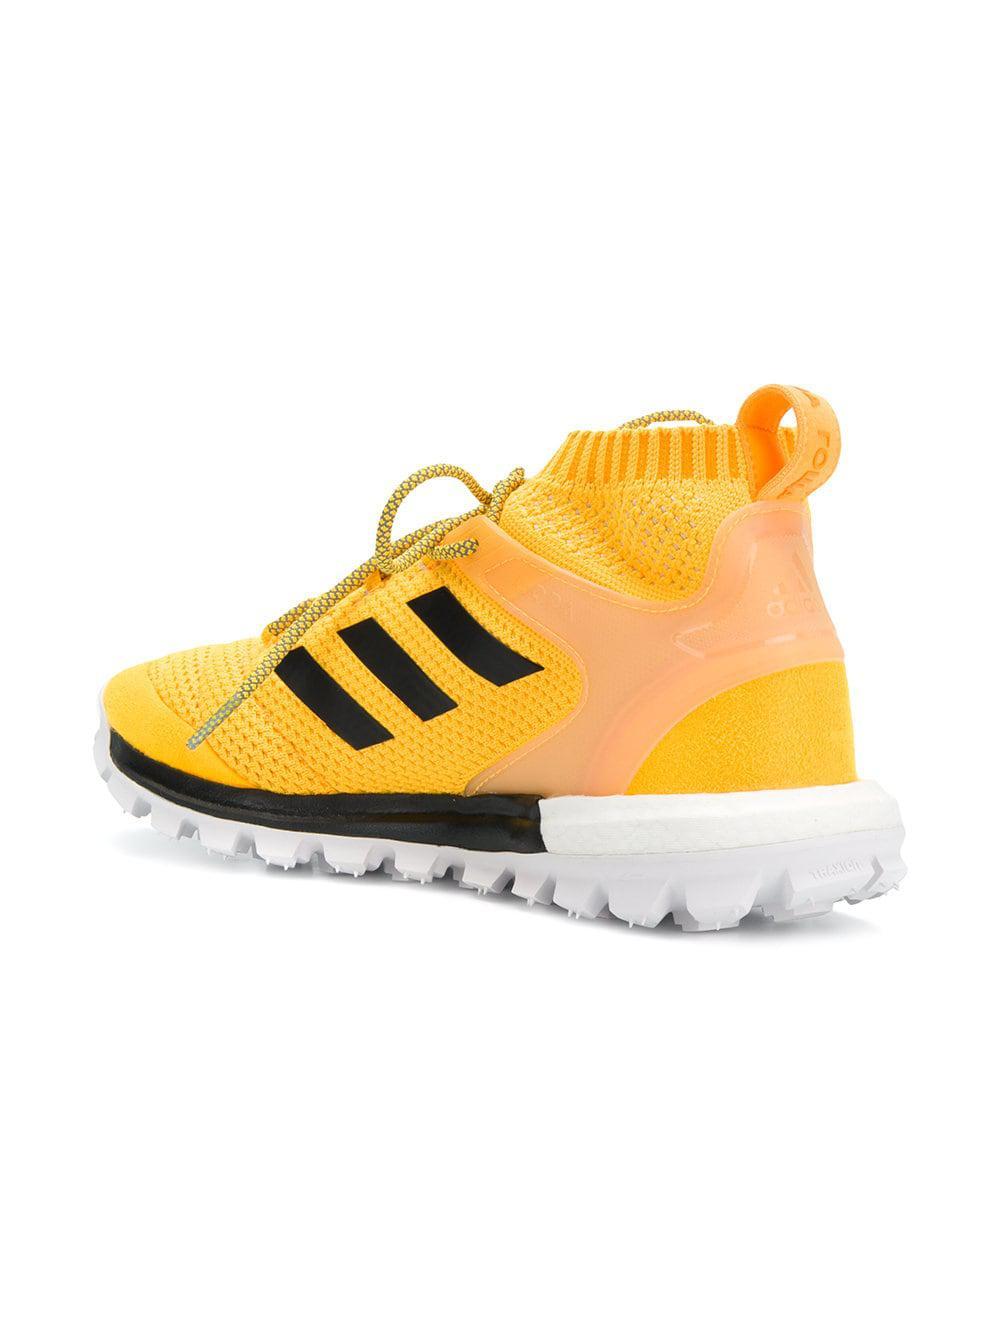 new arrival 64f46 3caf4 Gosha Rubchinskiy - Yellow X Adidas Copa Primeknit Sneakers - Lyst. View  fullscreen